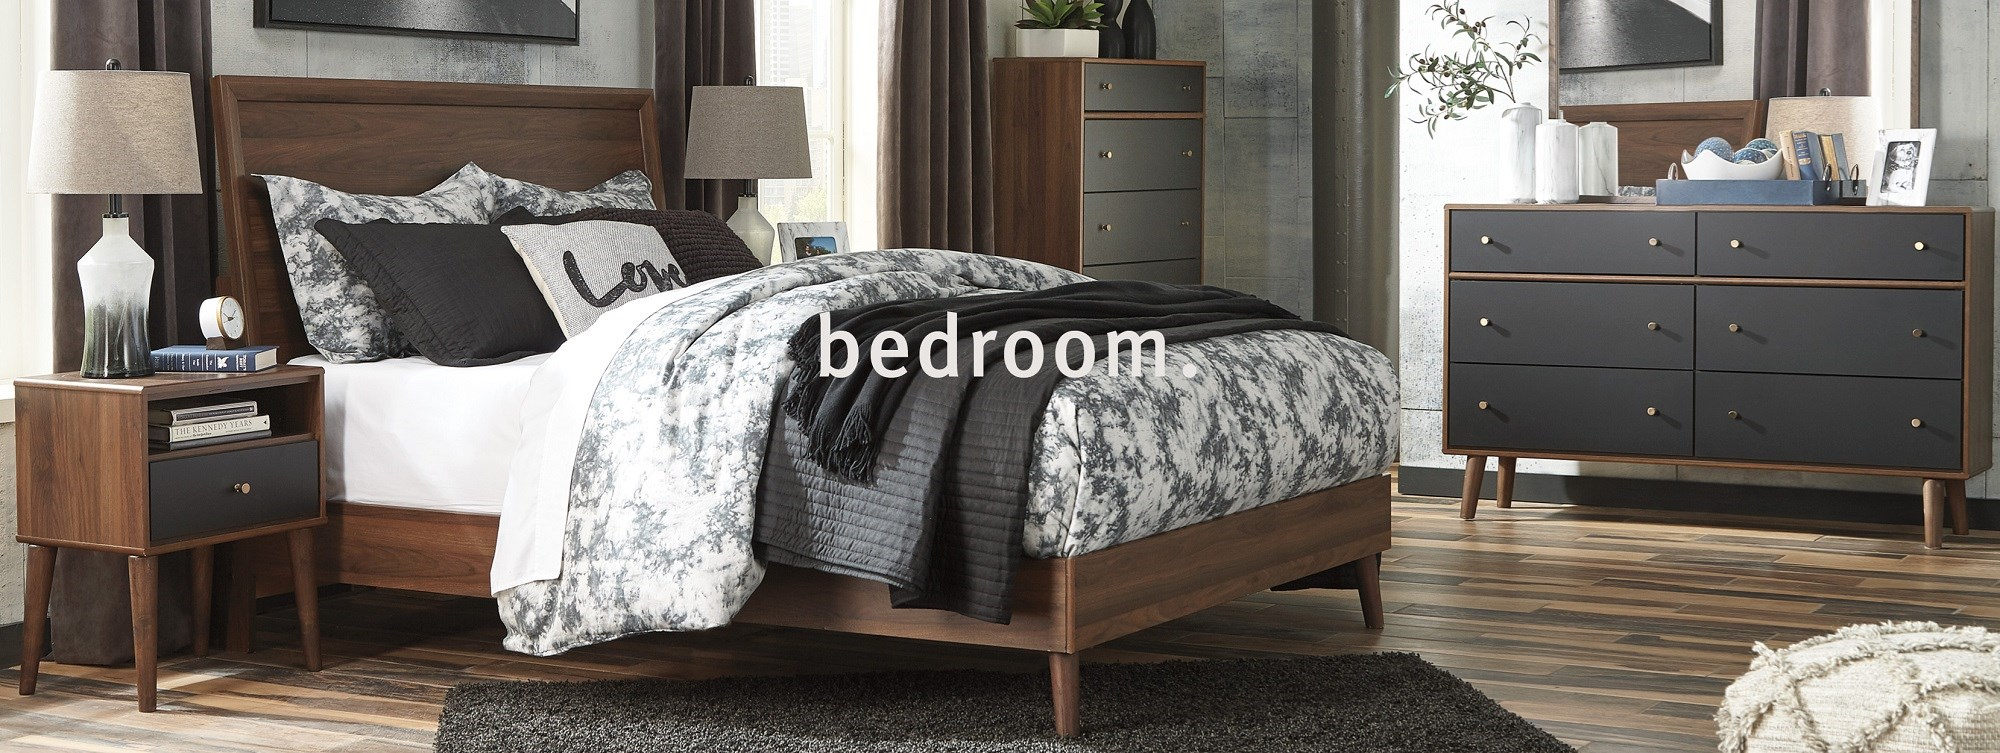 Shop Bedroom Furniture | Abode | Hawaii\'s Online Home Store